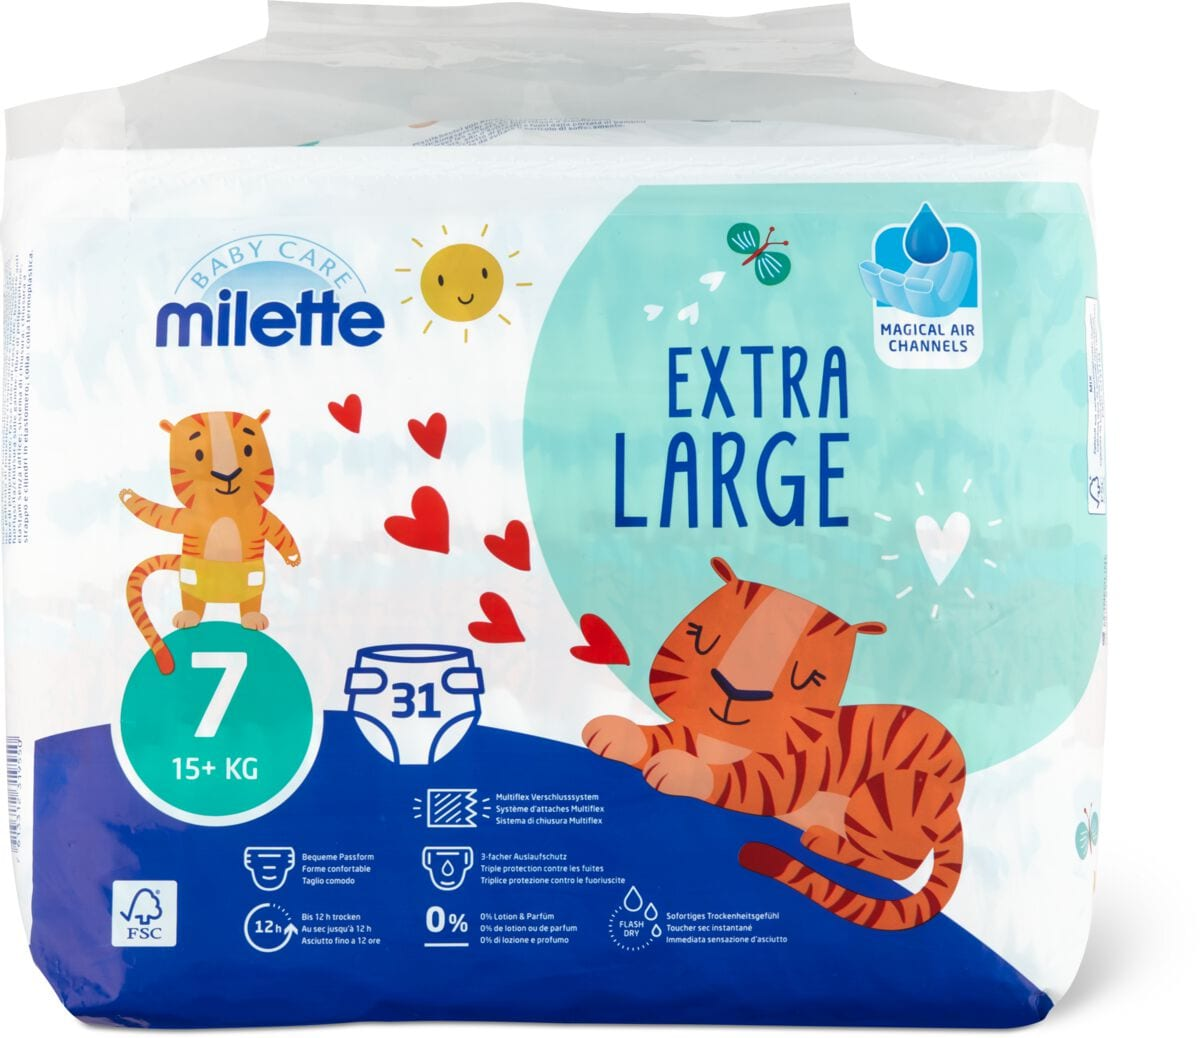 Milette Extra Large 7